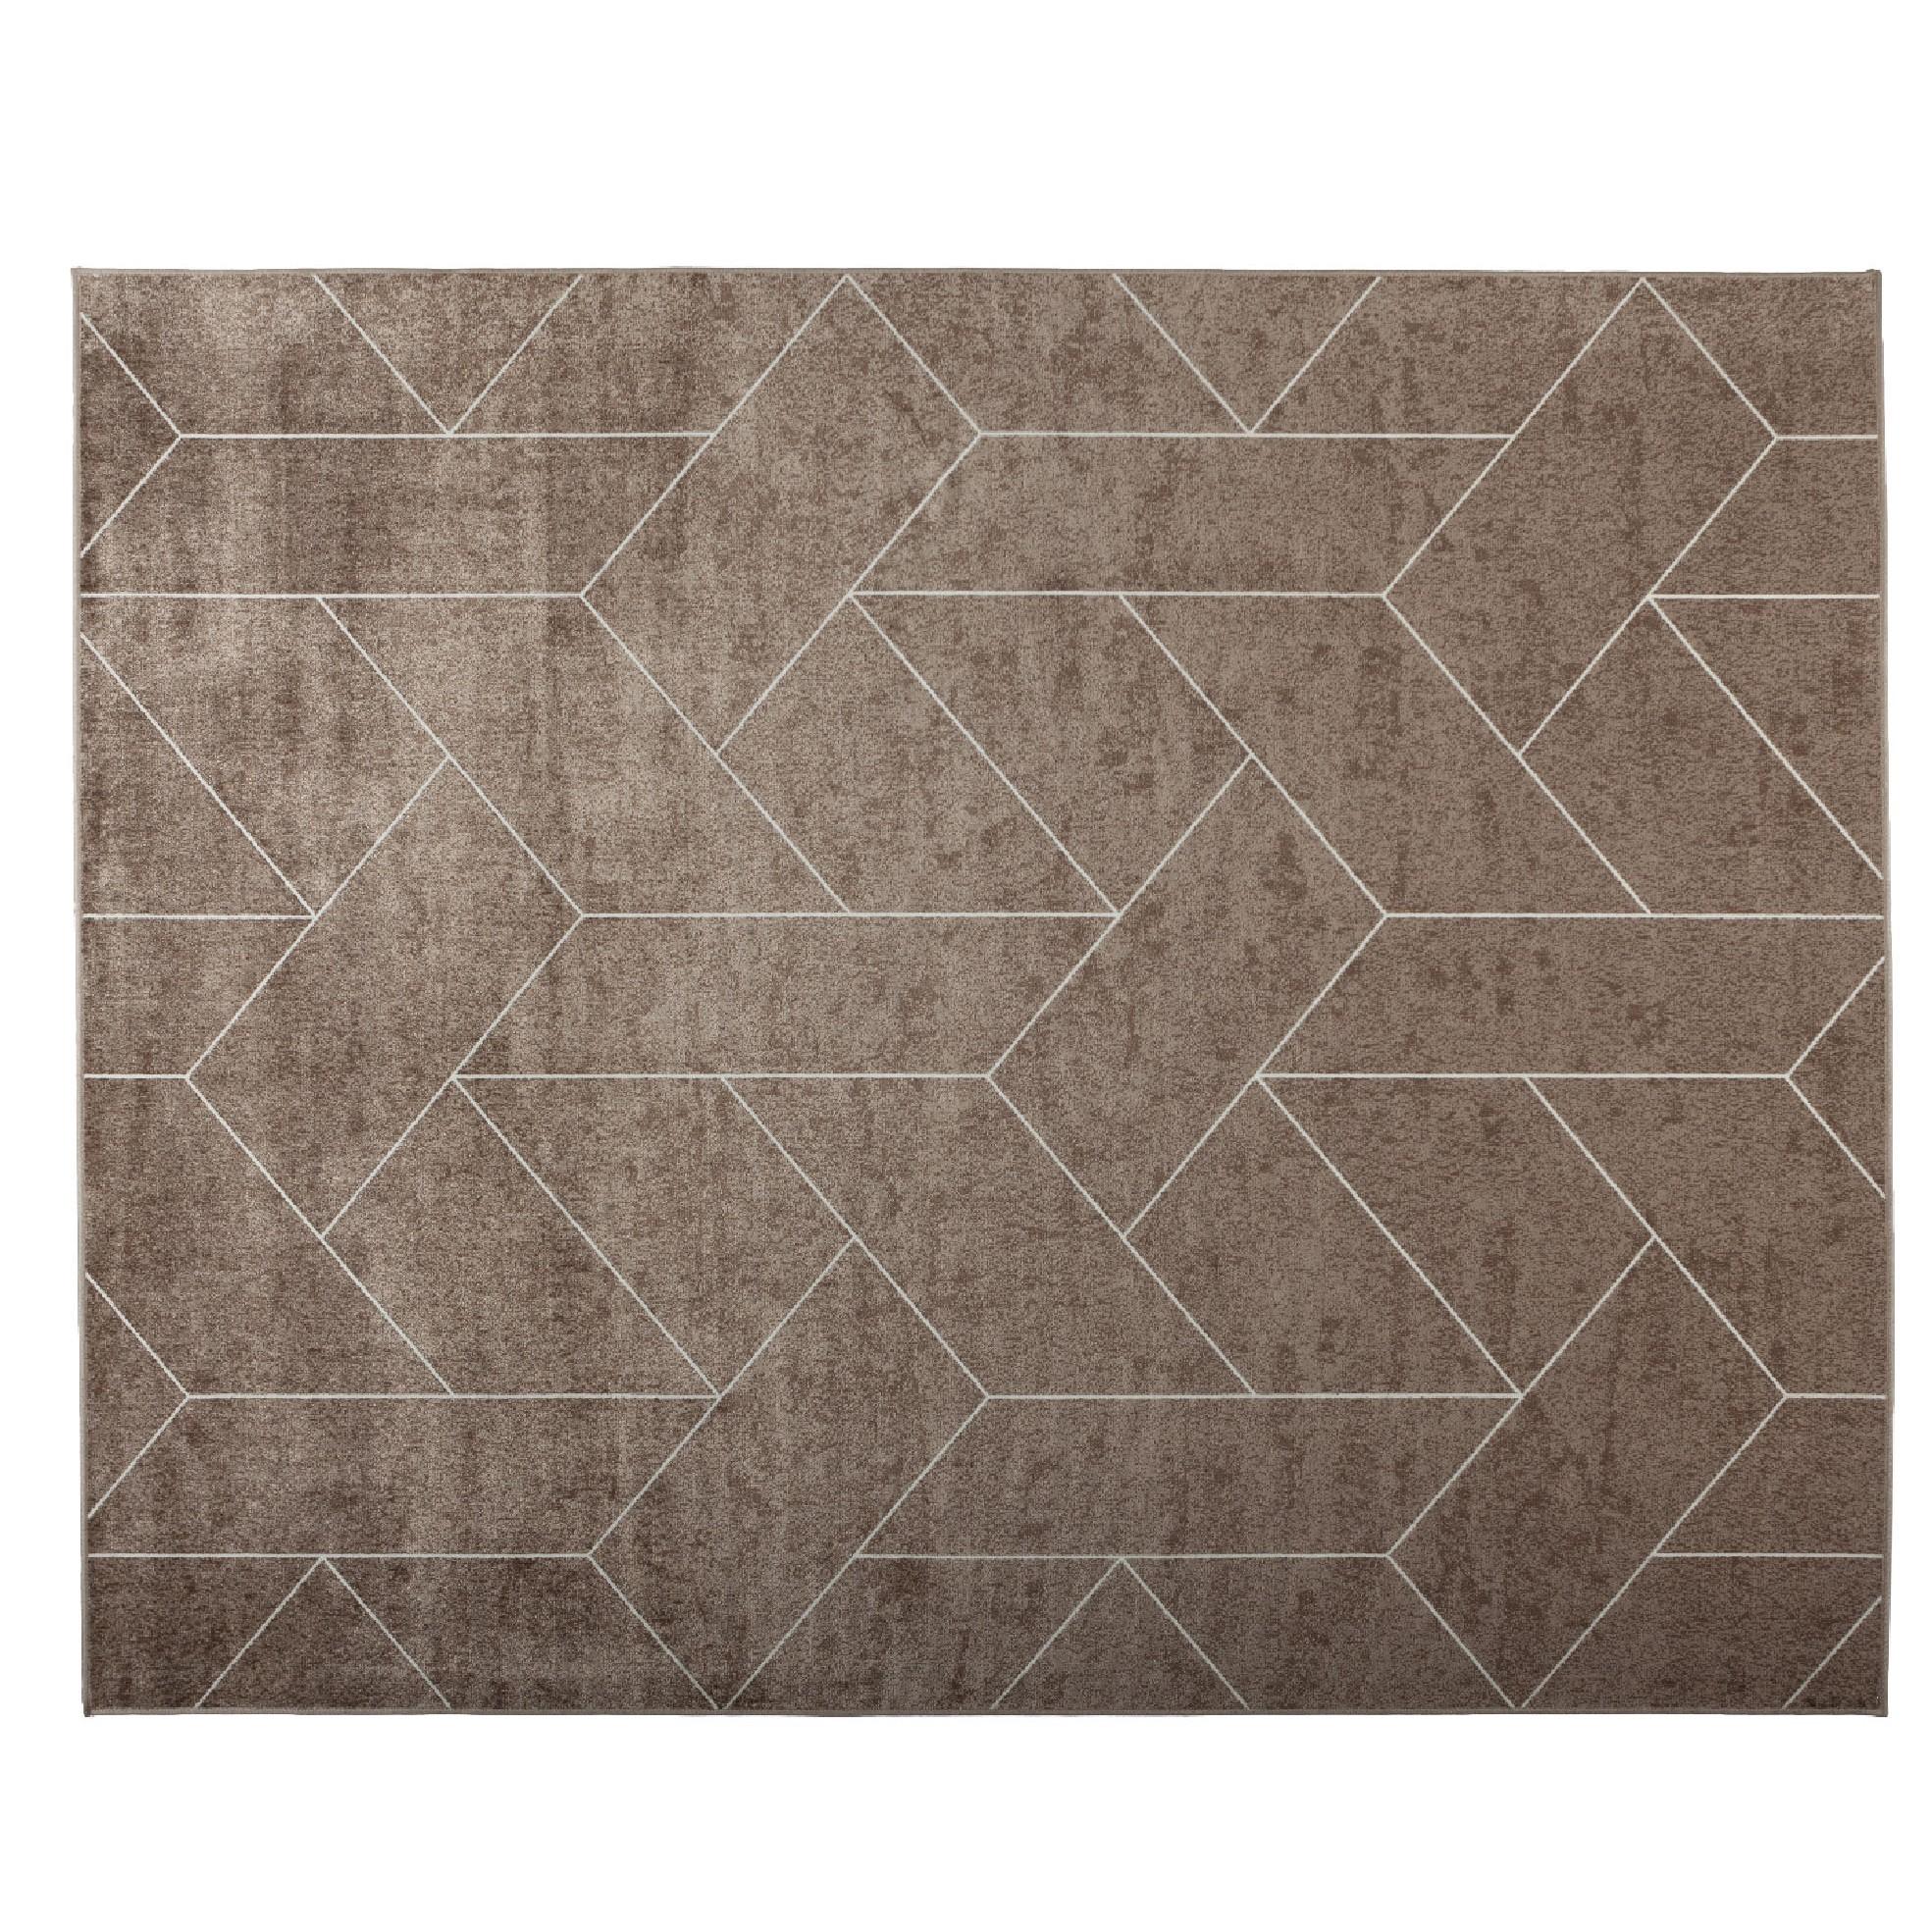 Tapete de Tecido Belga 200x250 cm 594 - Fatex